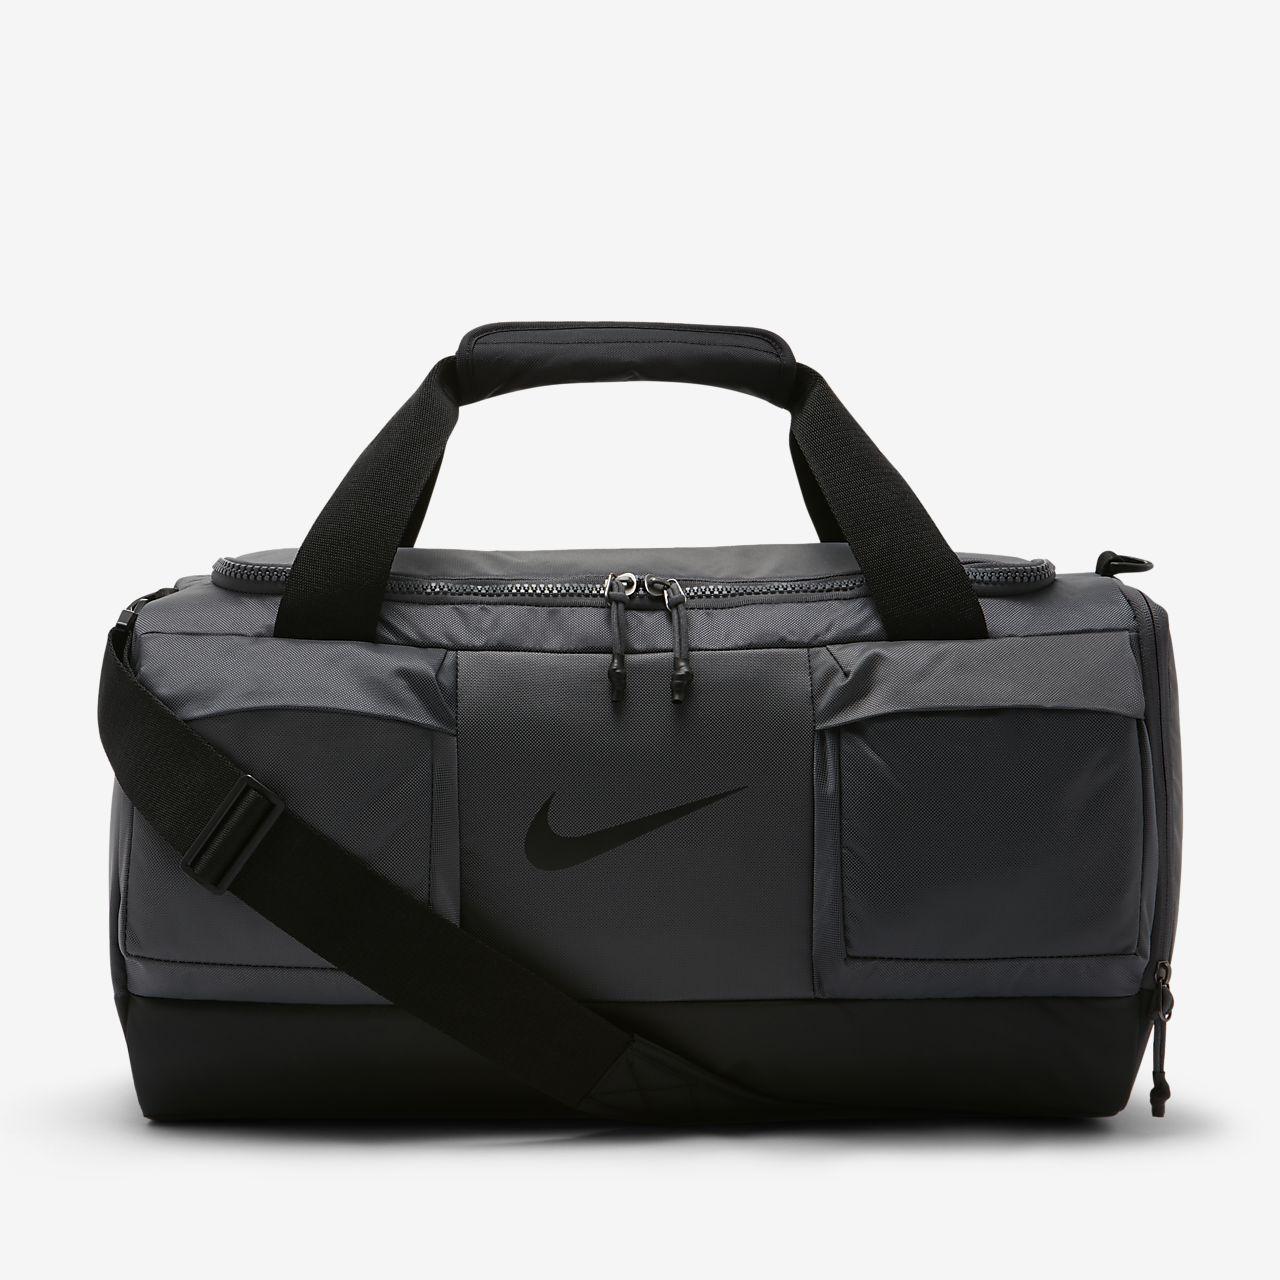 Nike Vapor Power Men's Training Duffel Bag (Small)